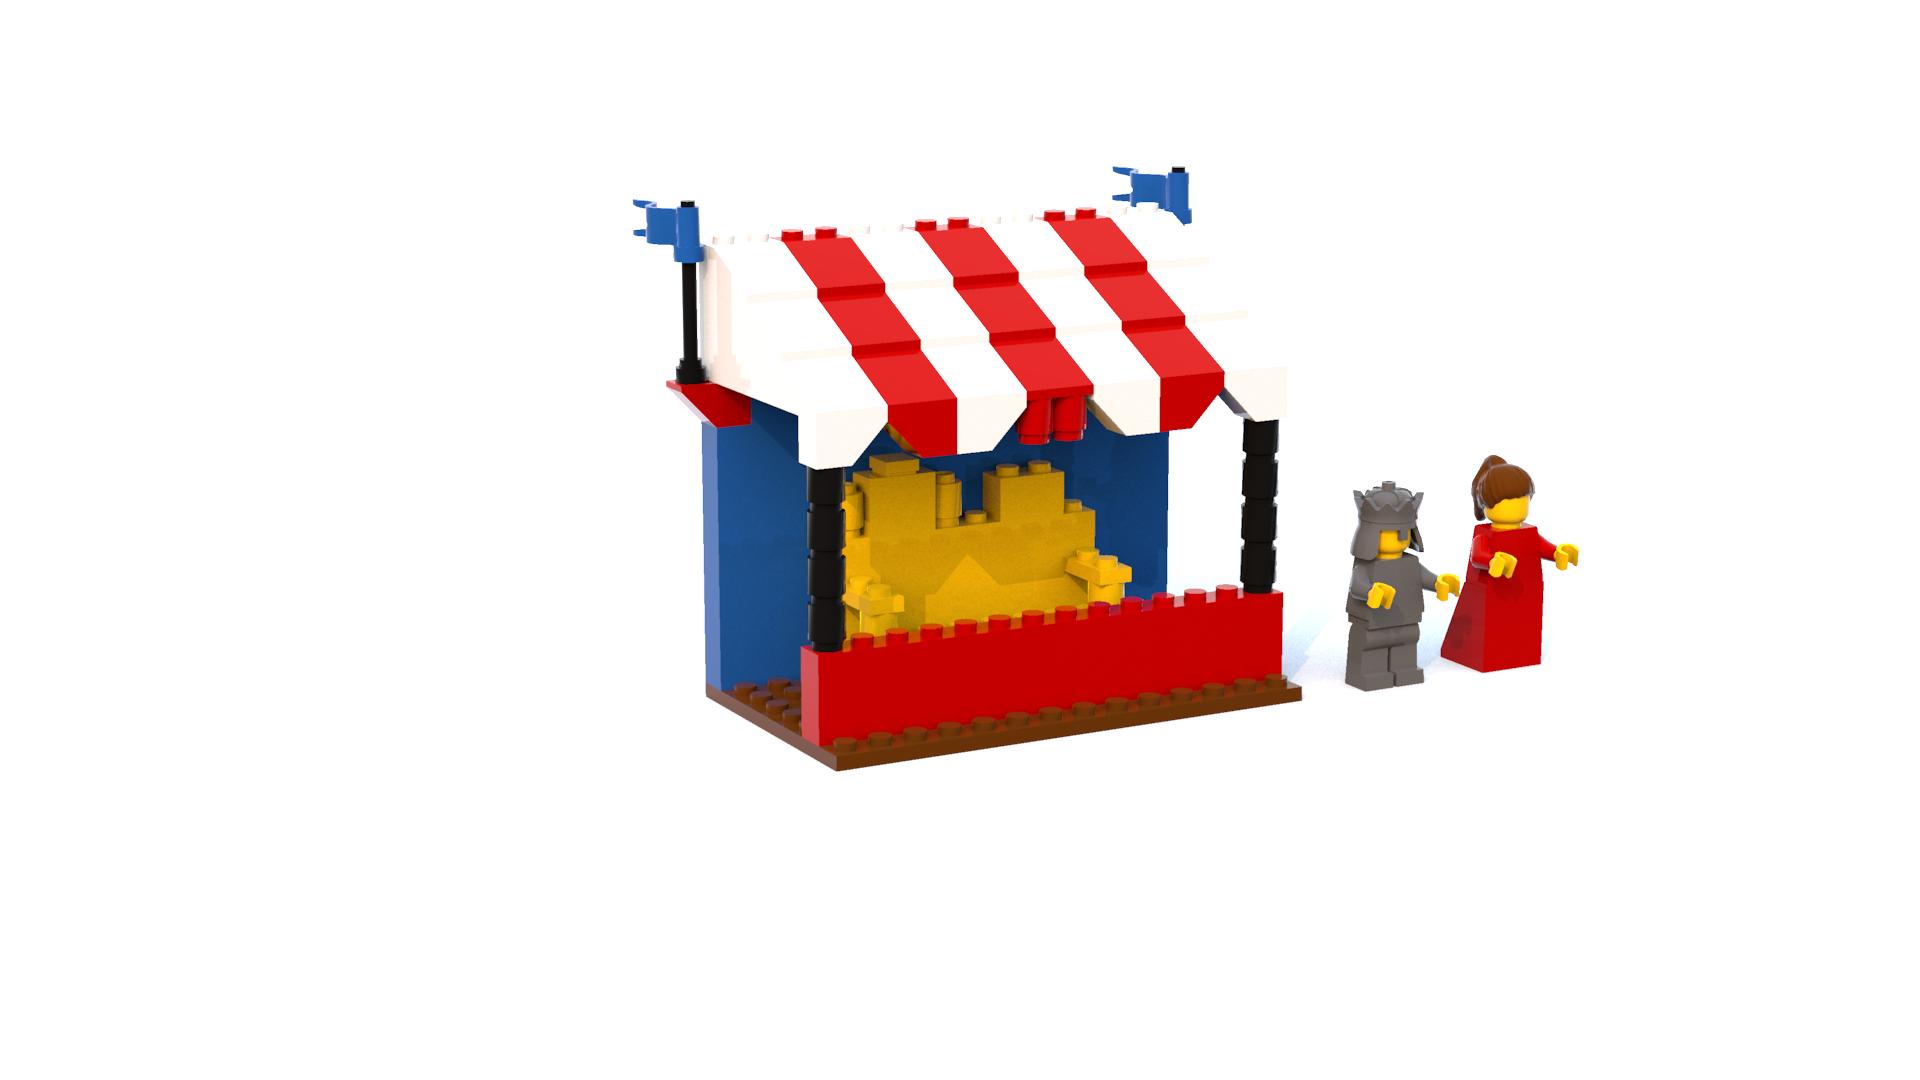 Lego Island 2 King Leo's Spectator Gallery LDD Model